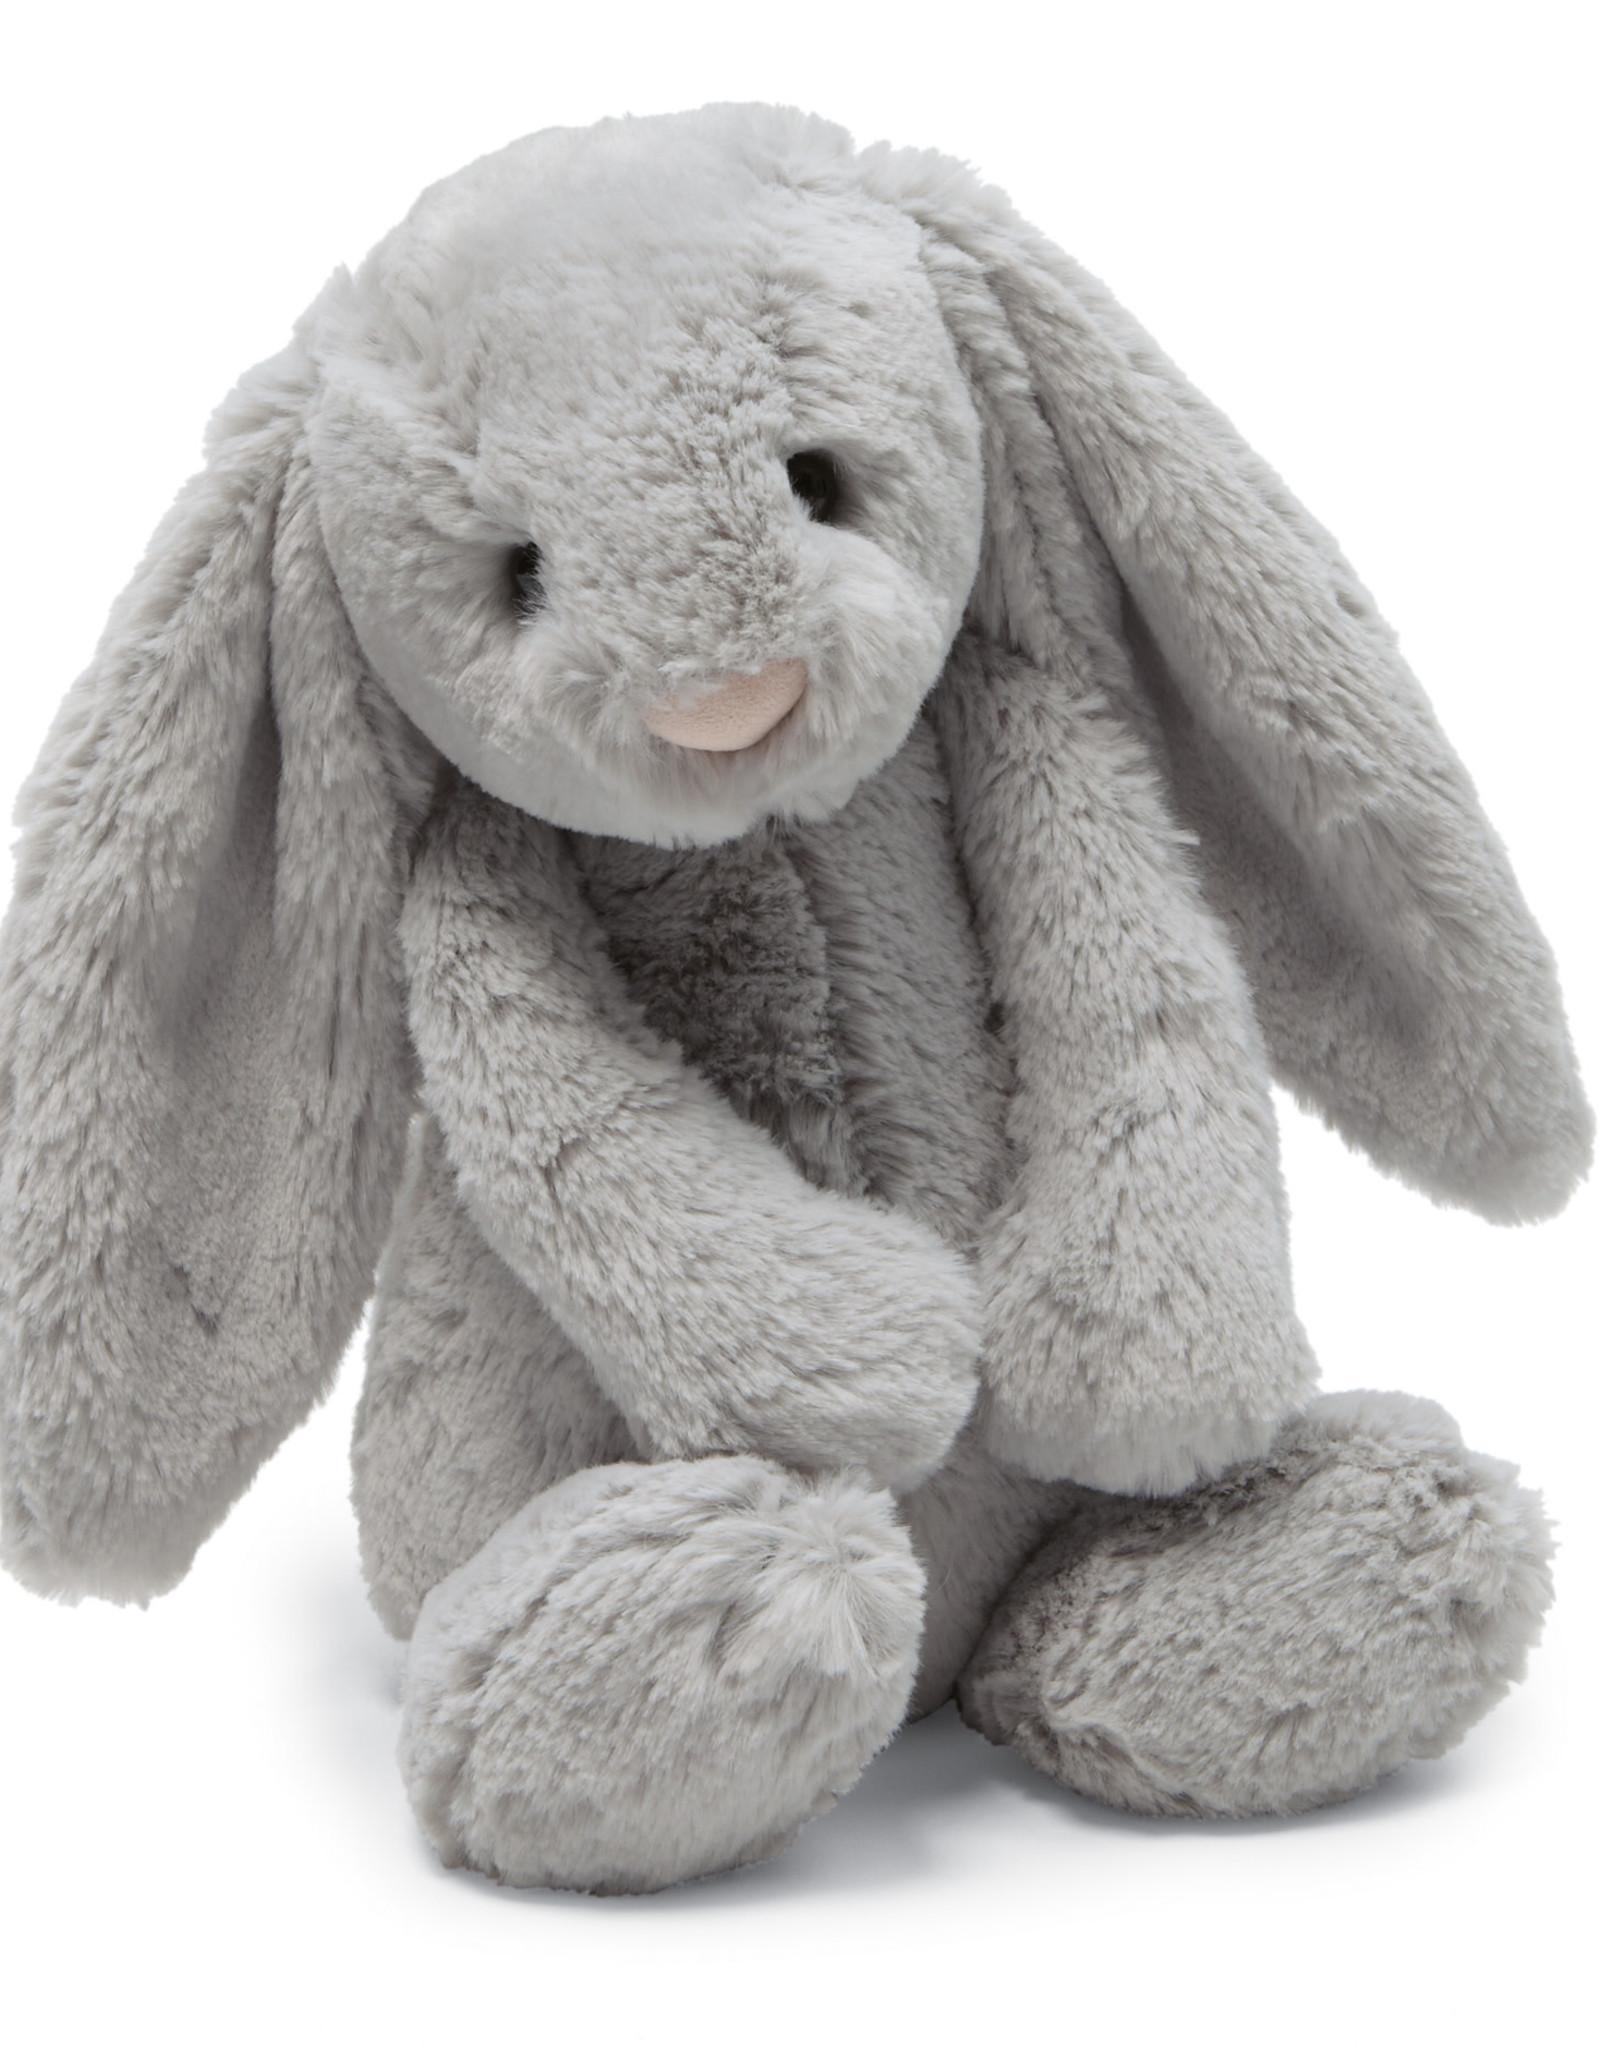 Jellycat bashful grey bunny - small